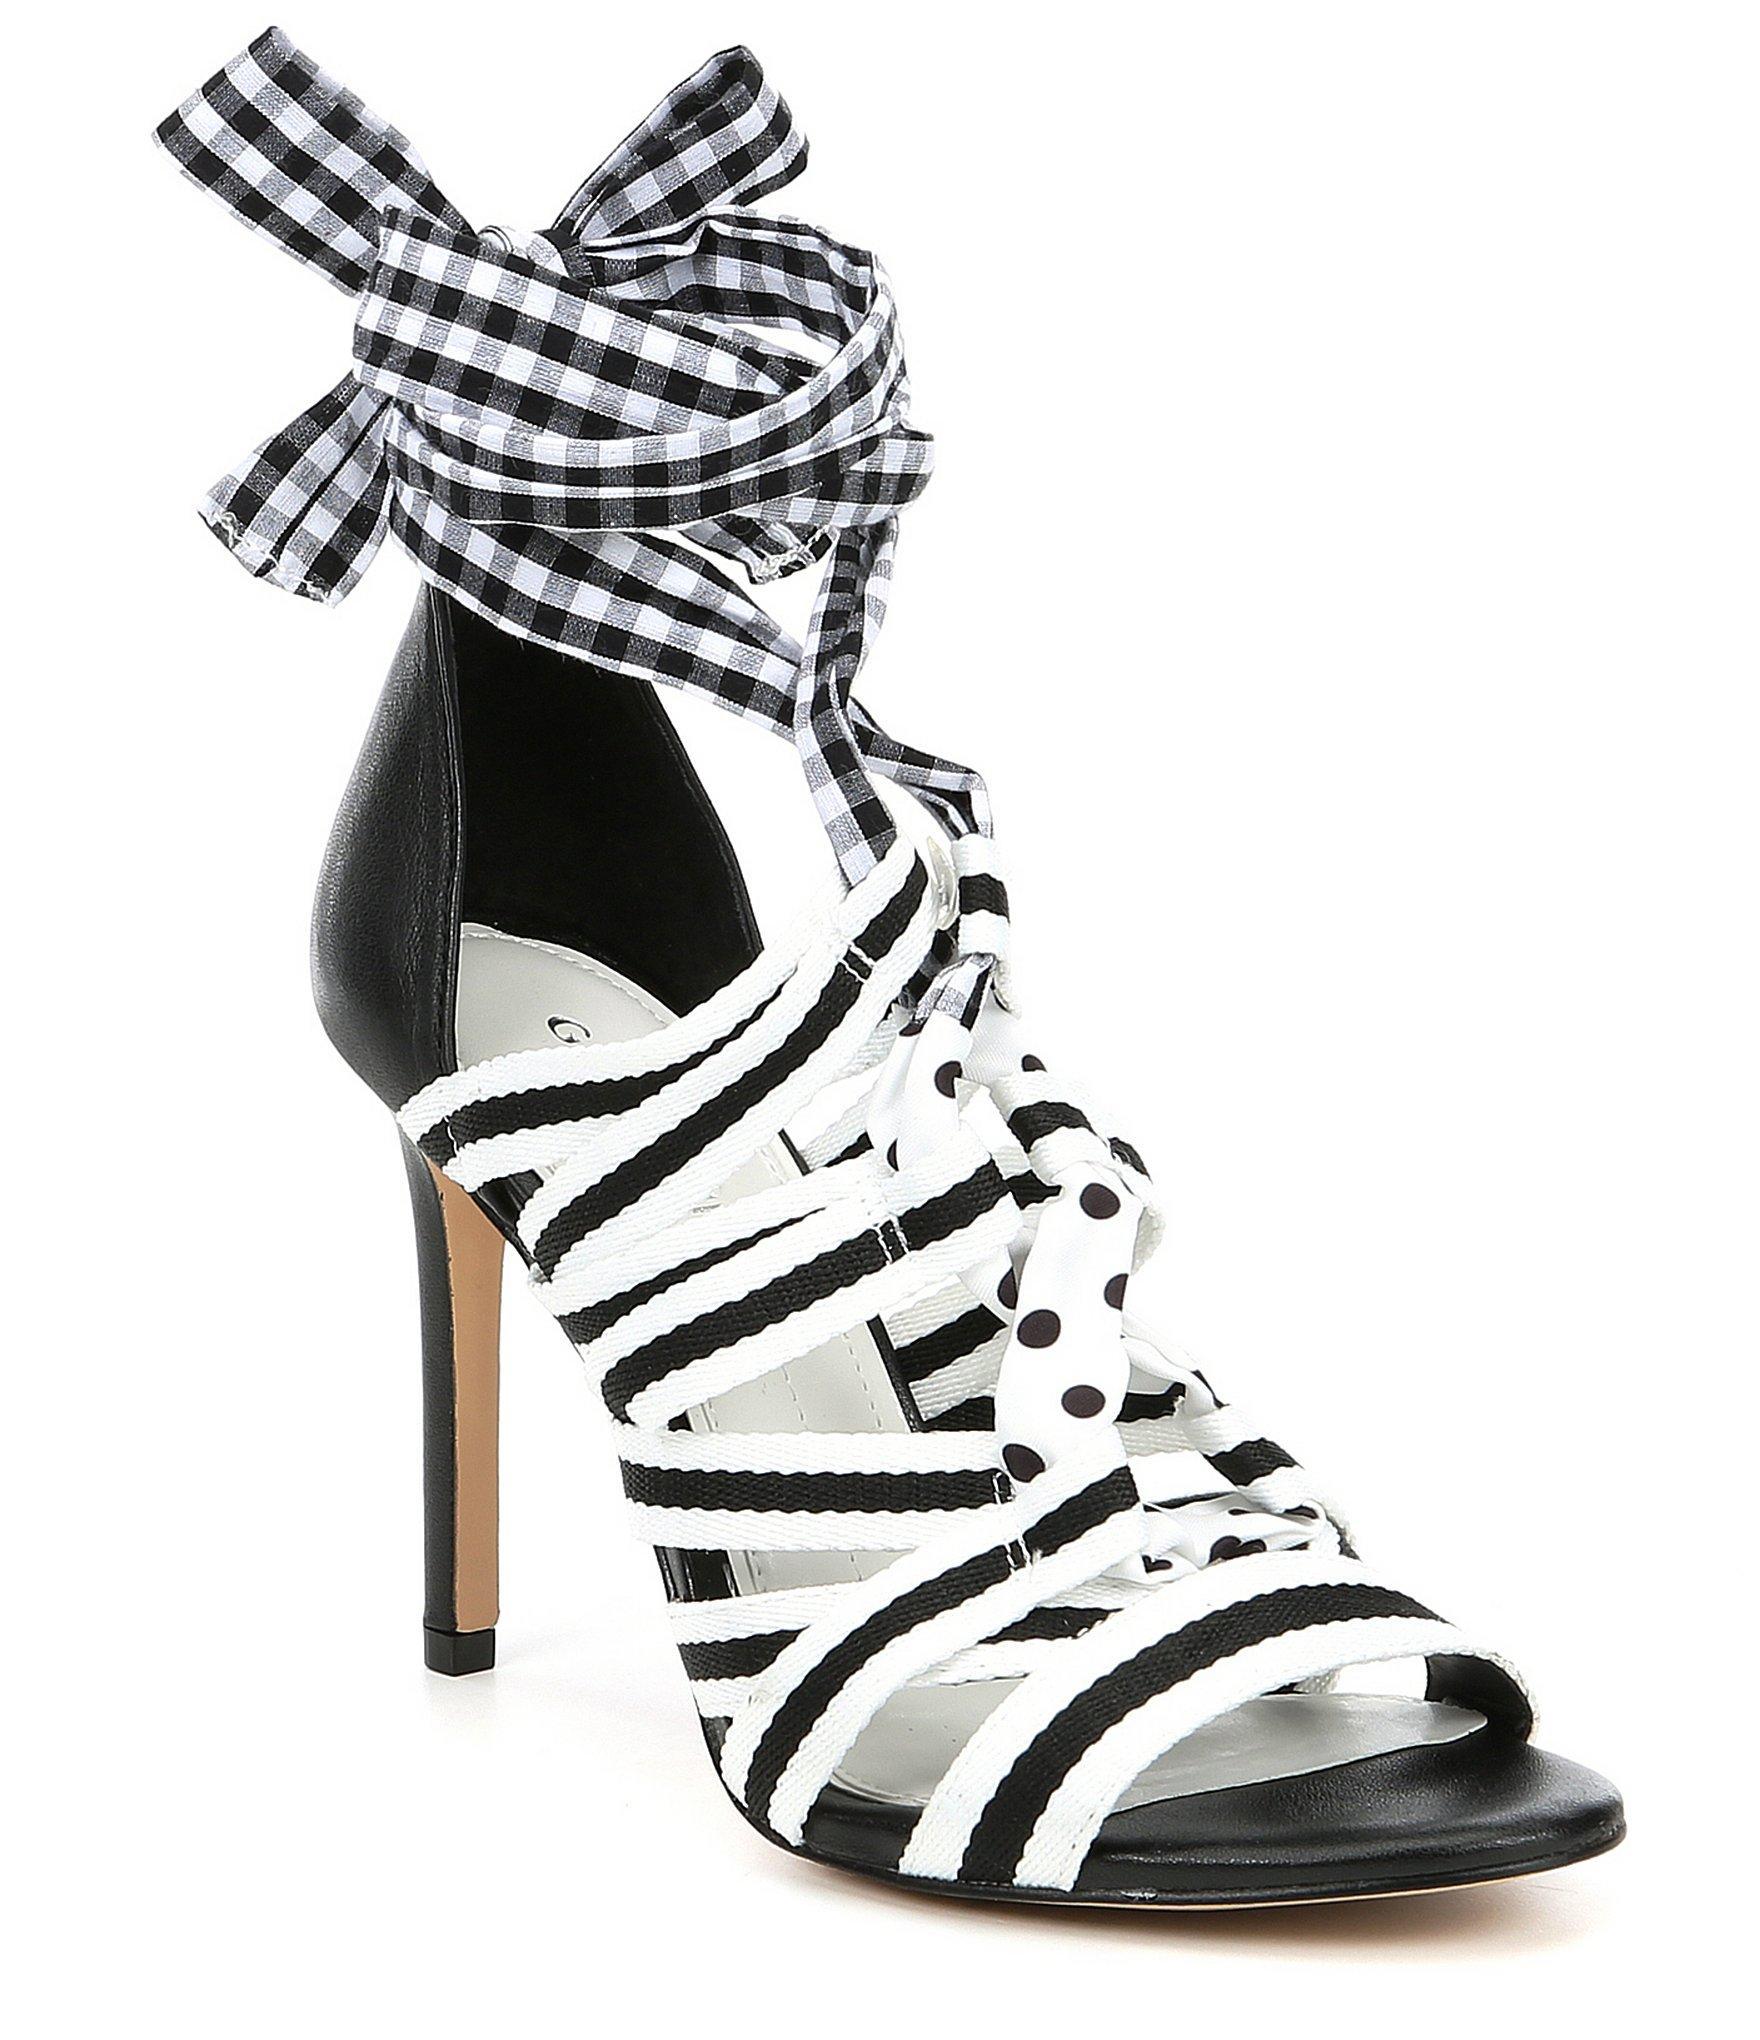 76e44a2623 Gianni Bini Abrianna Gingham Lace Up Dress Sandals in Black - Save ...